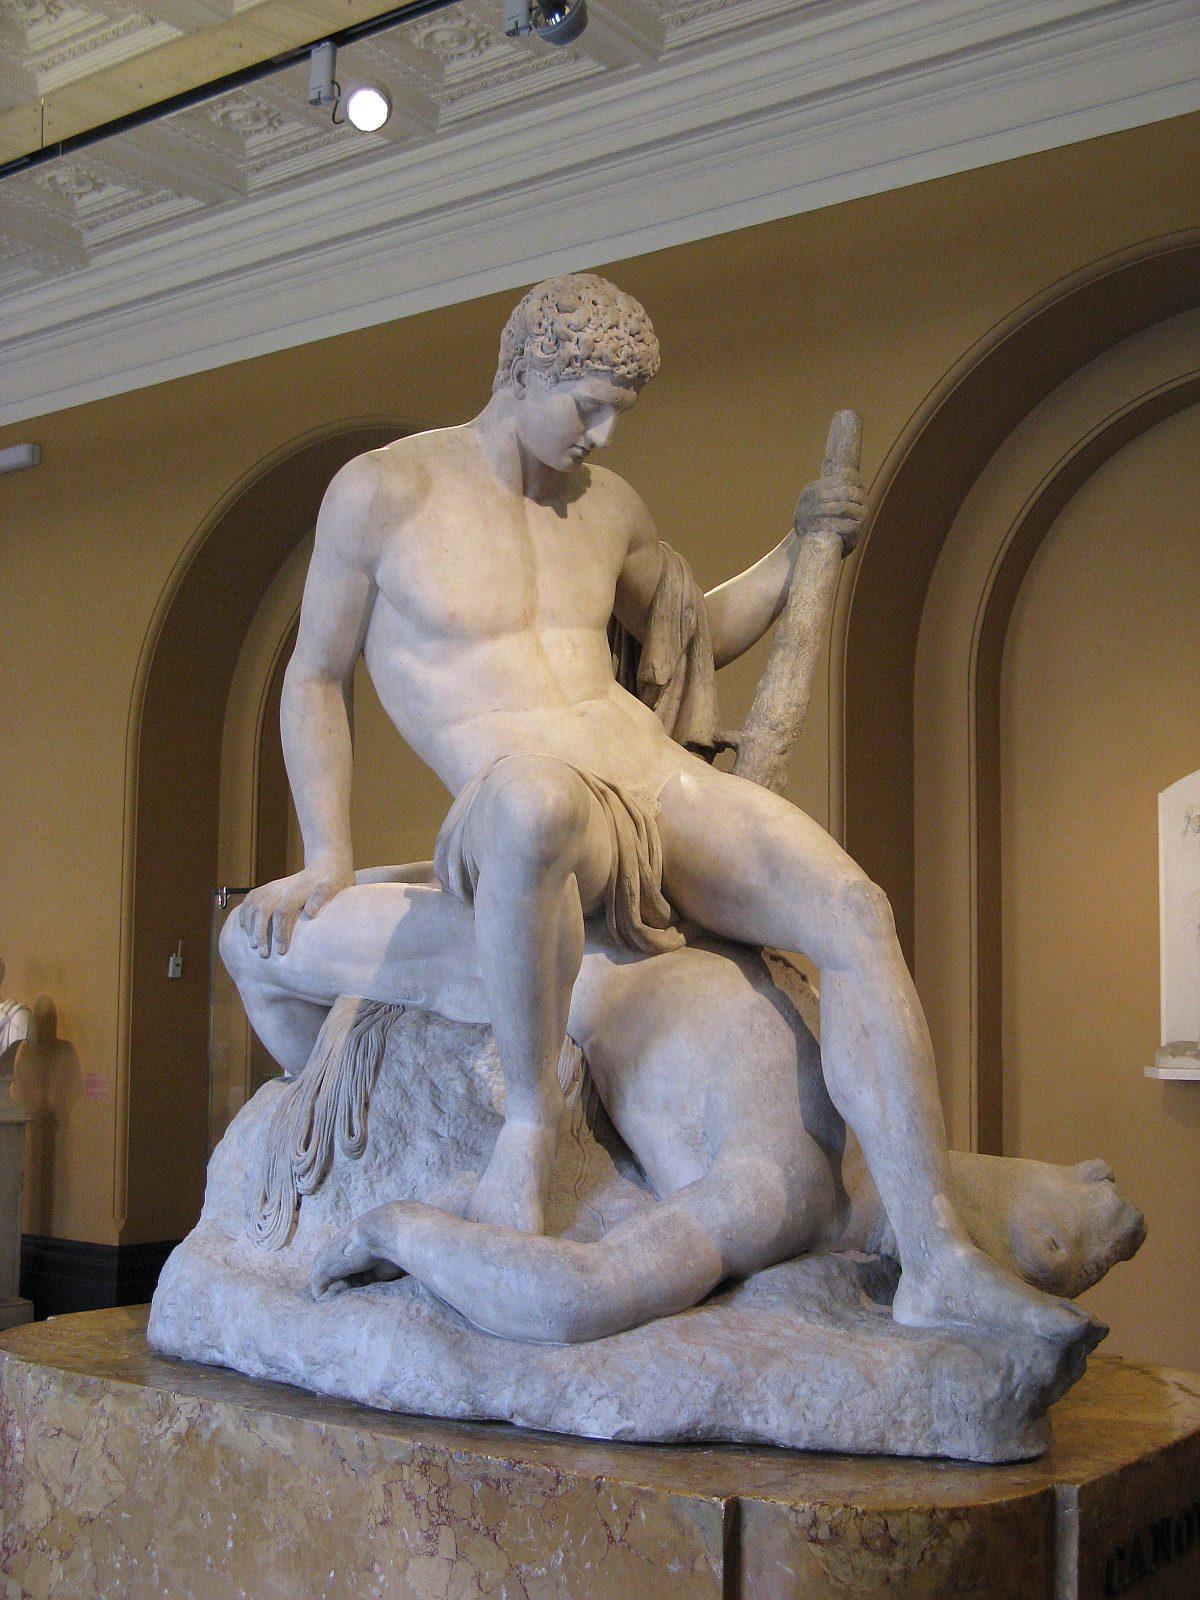 Antonio Canova Theseus and the Minotaur Victoria and Albert Museum